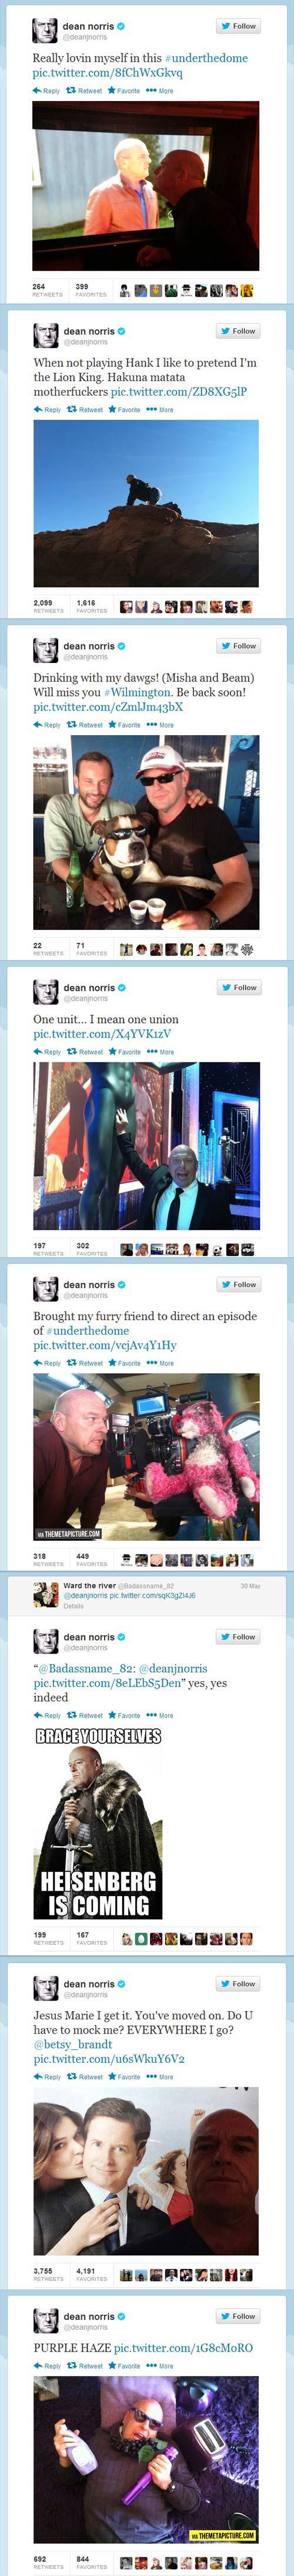 Breaking Bad's Dean Norris on Twitter…